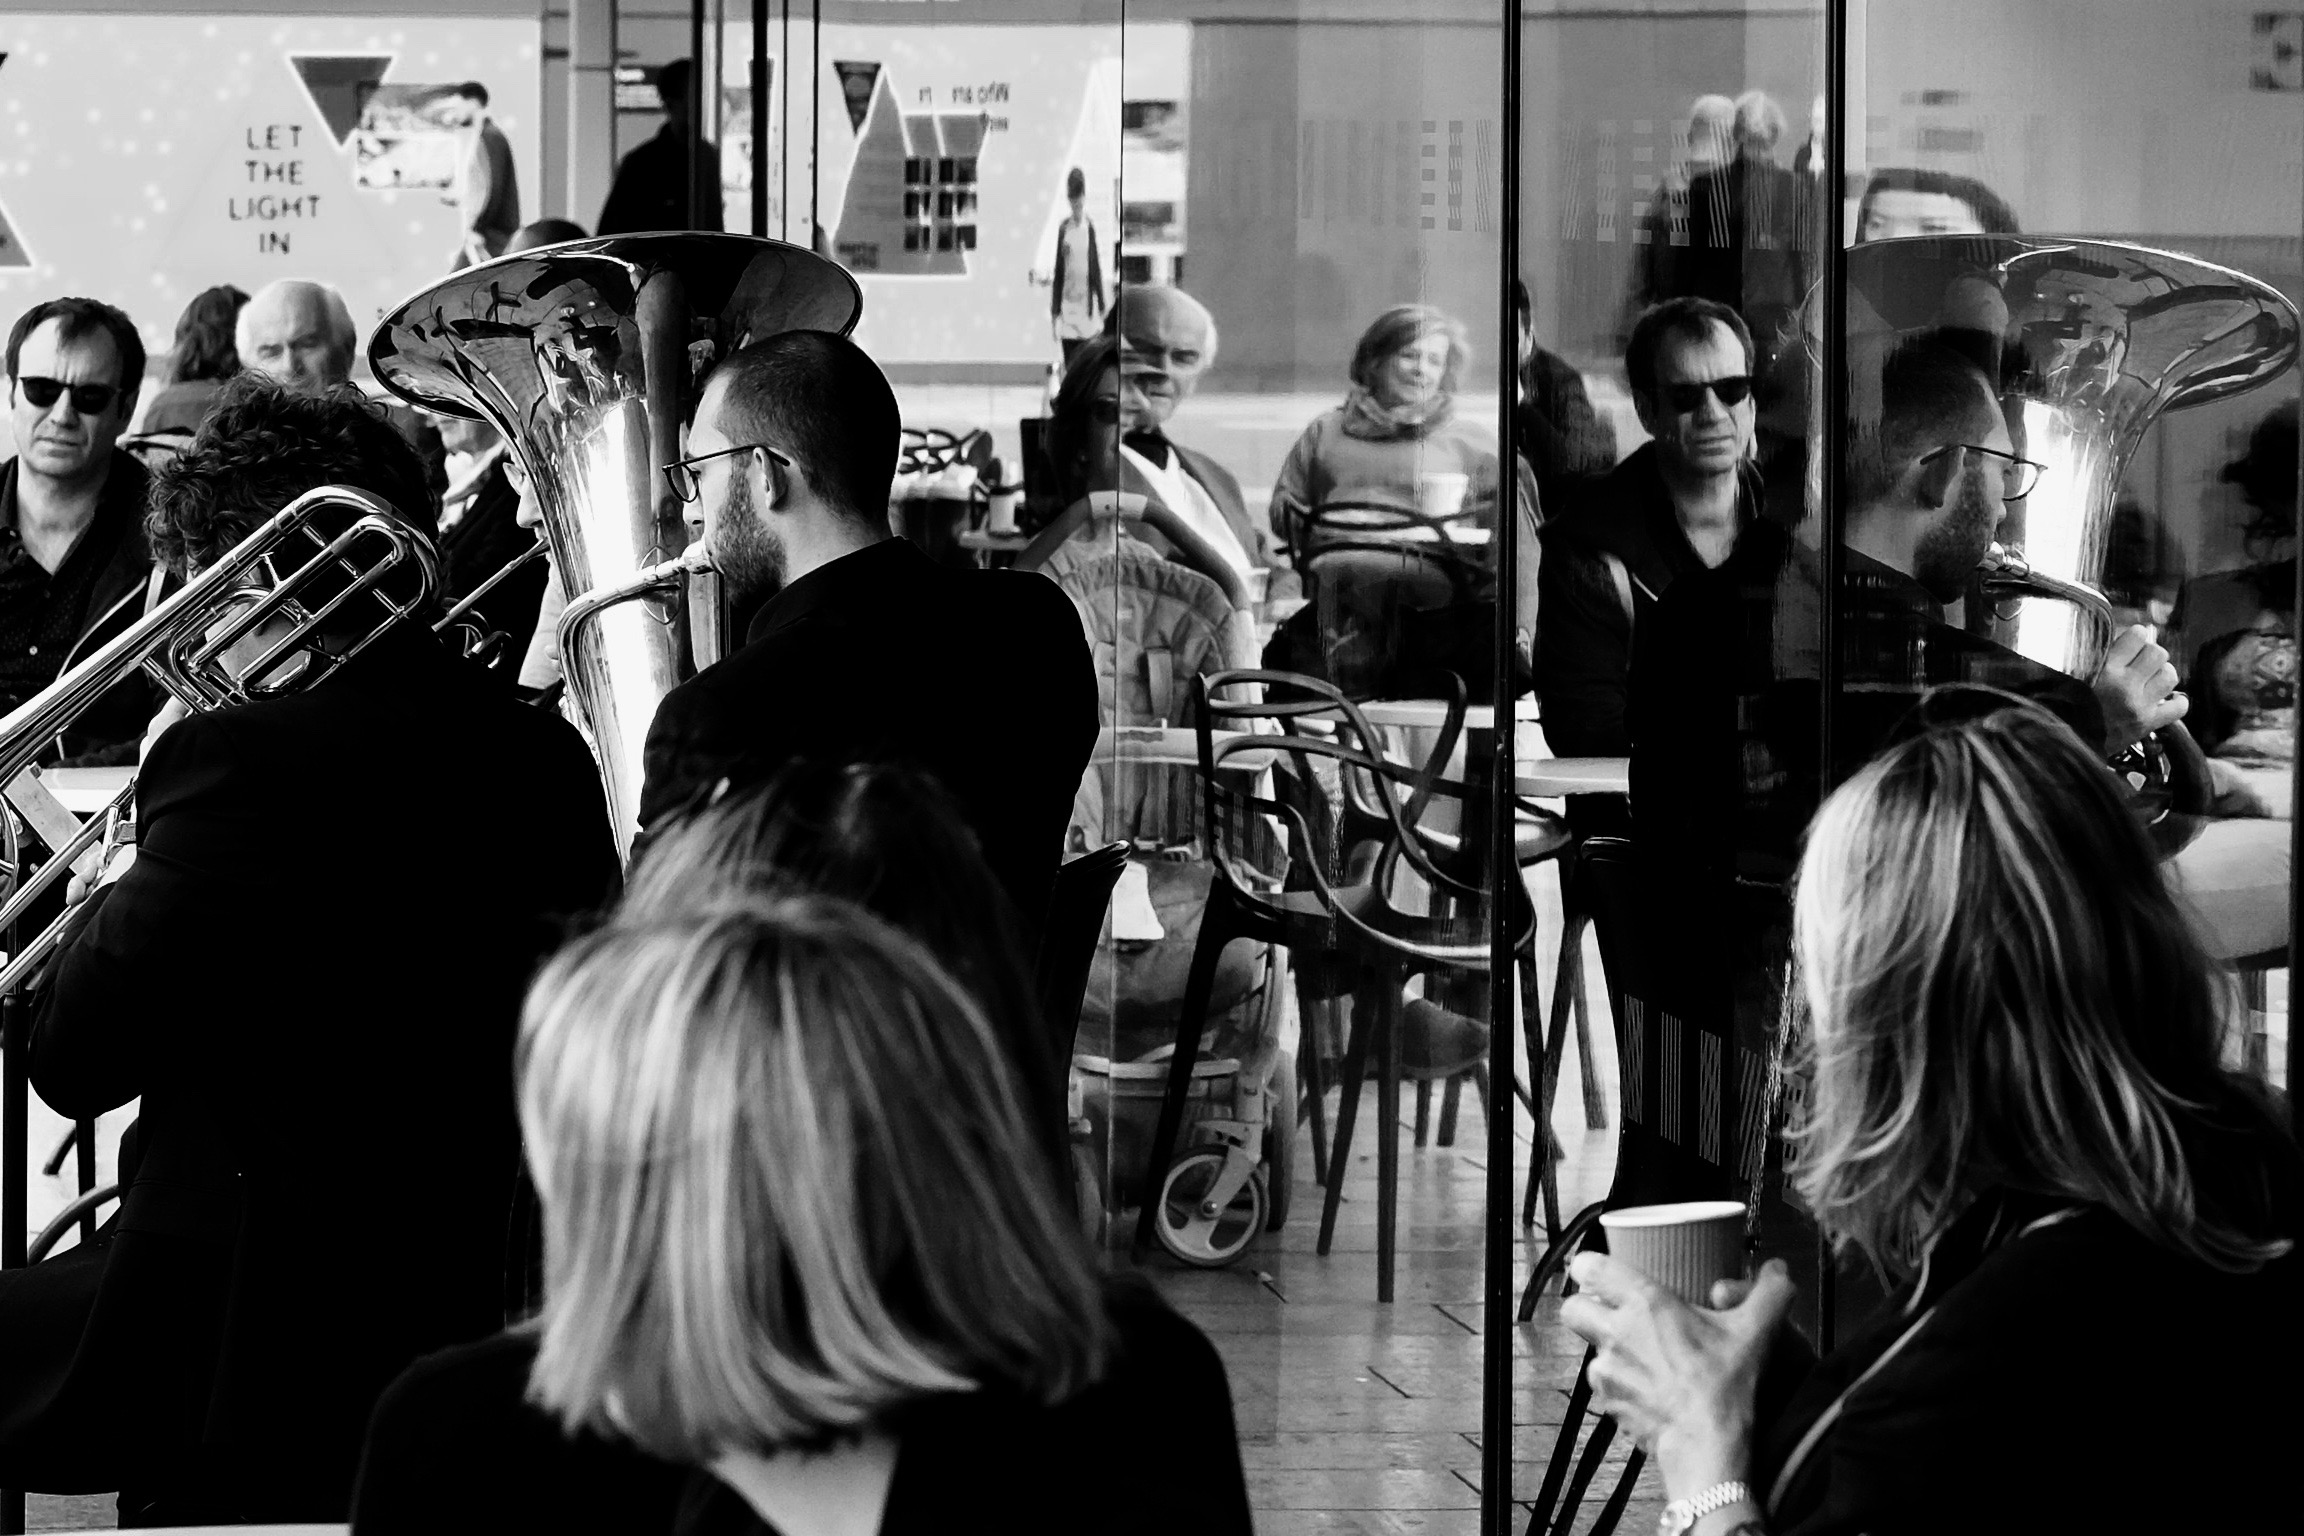 BRASS WALK WITH LONDON SINFONIETTA, Nordic Music Days, SBC London,30 September 2017, Photo: Paola Padoan